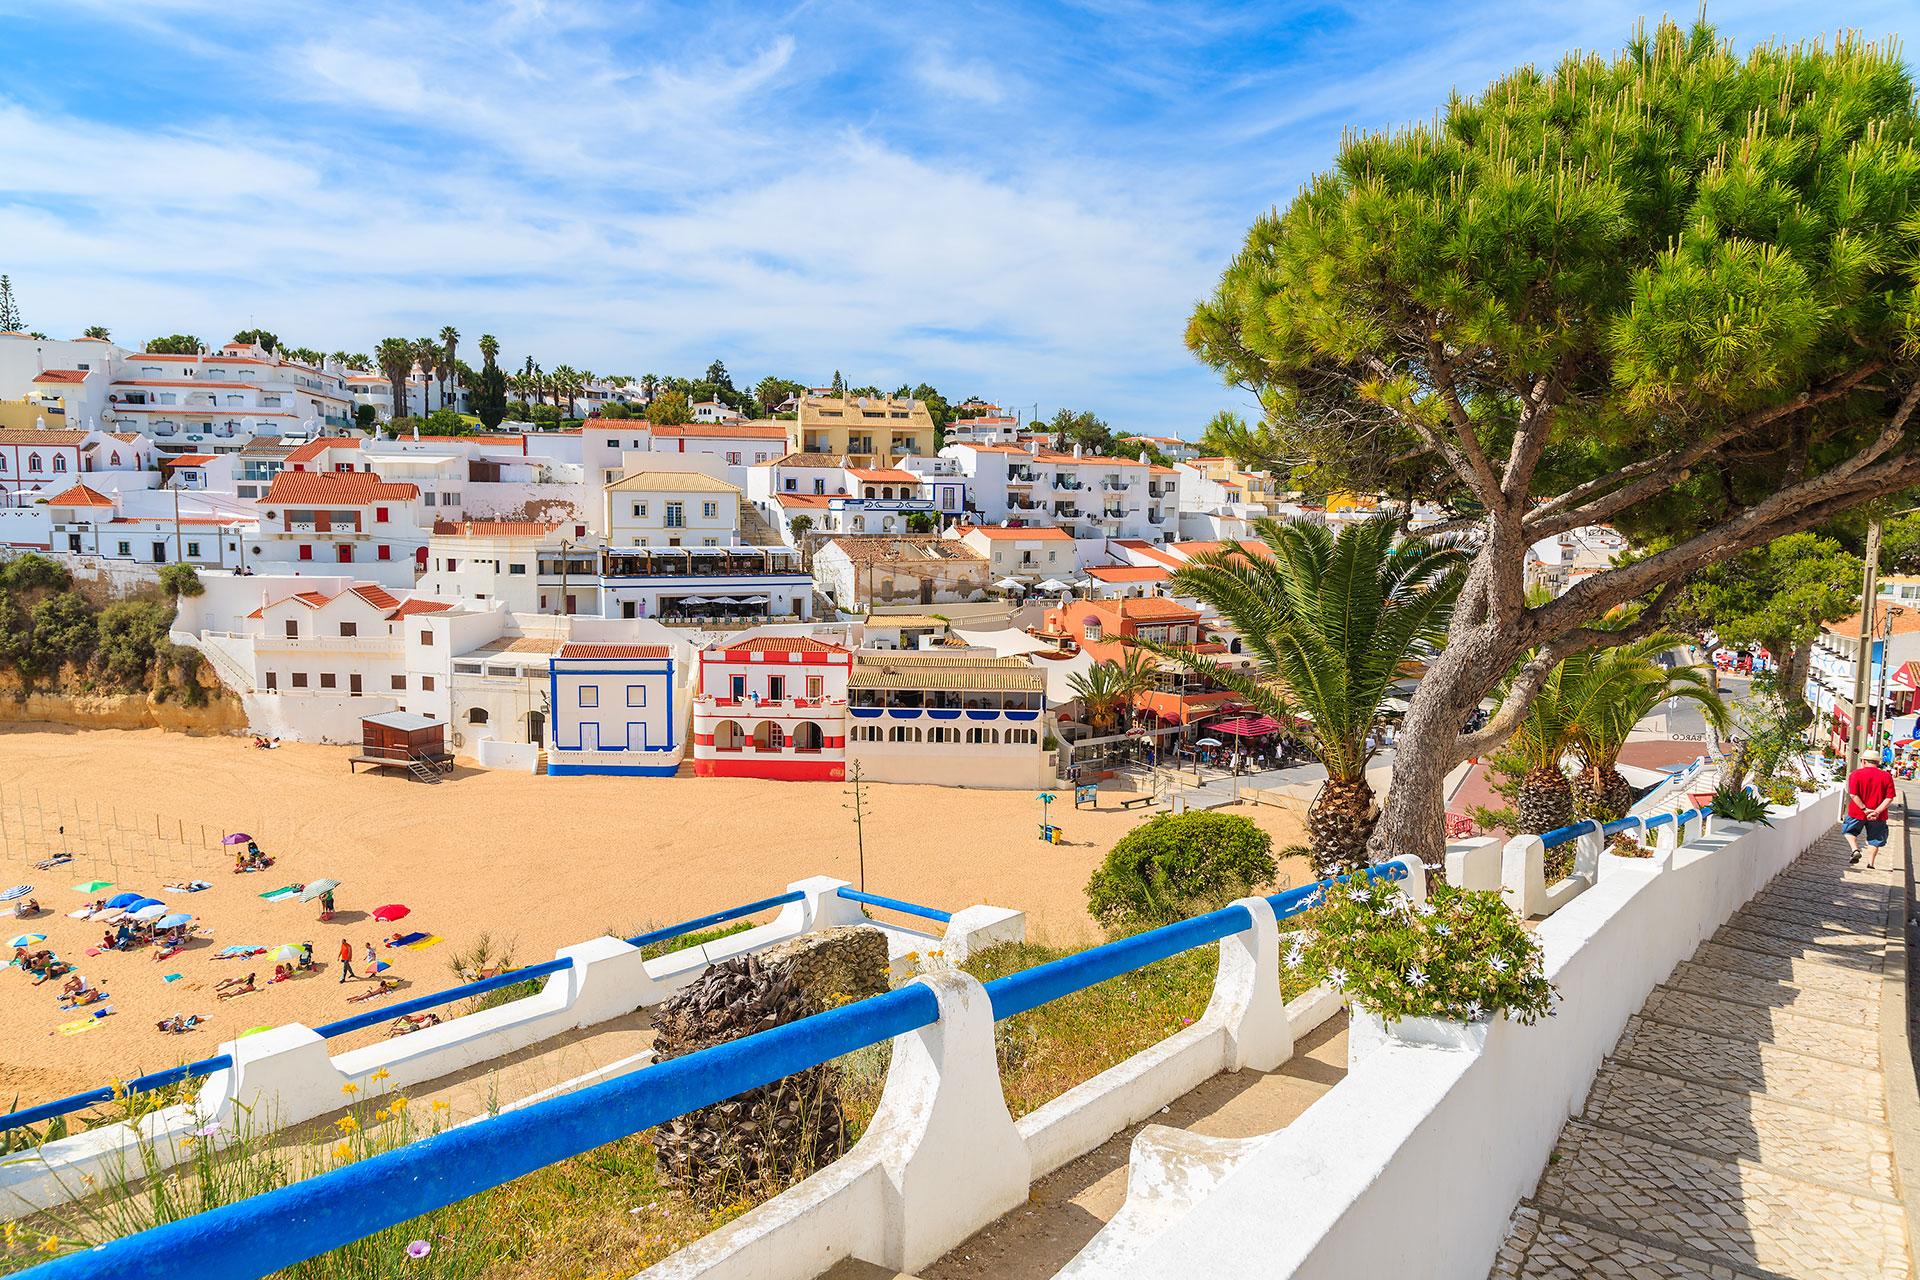 Algarve, Portugal; Courtesy of Pawel Kazmierczak/Shutterstock.com